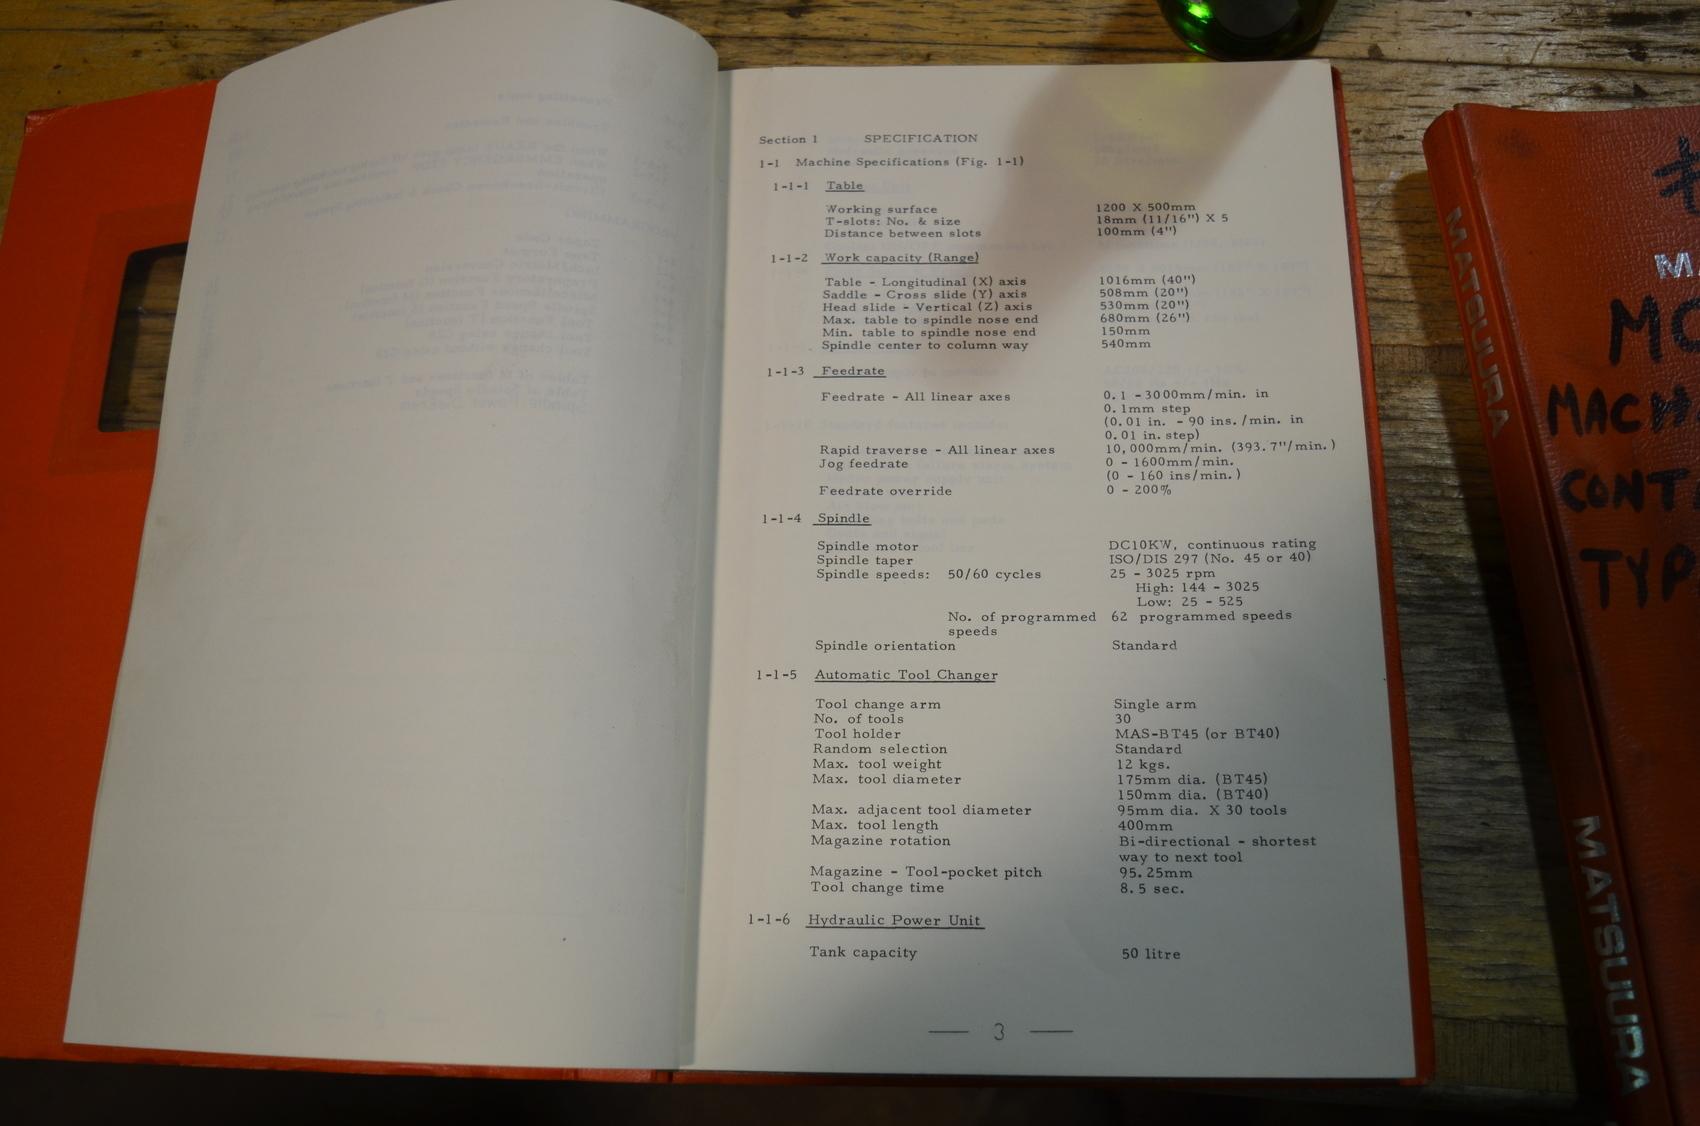 Lot Of 2 Manuals For Matsuura Mc 1000v W Electric Schematic Inv Elec Wiring Diagram Mubea Ironworker 3 6 Inv23963